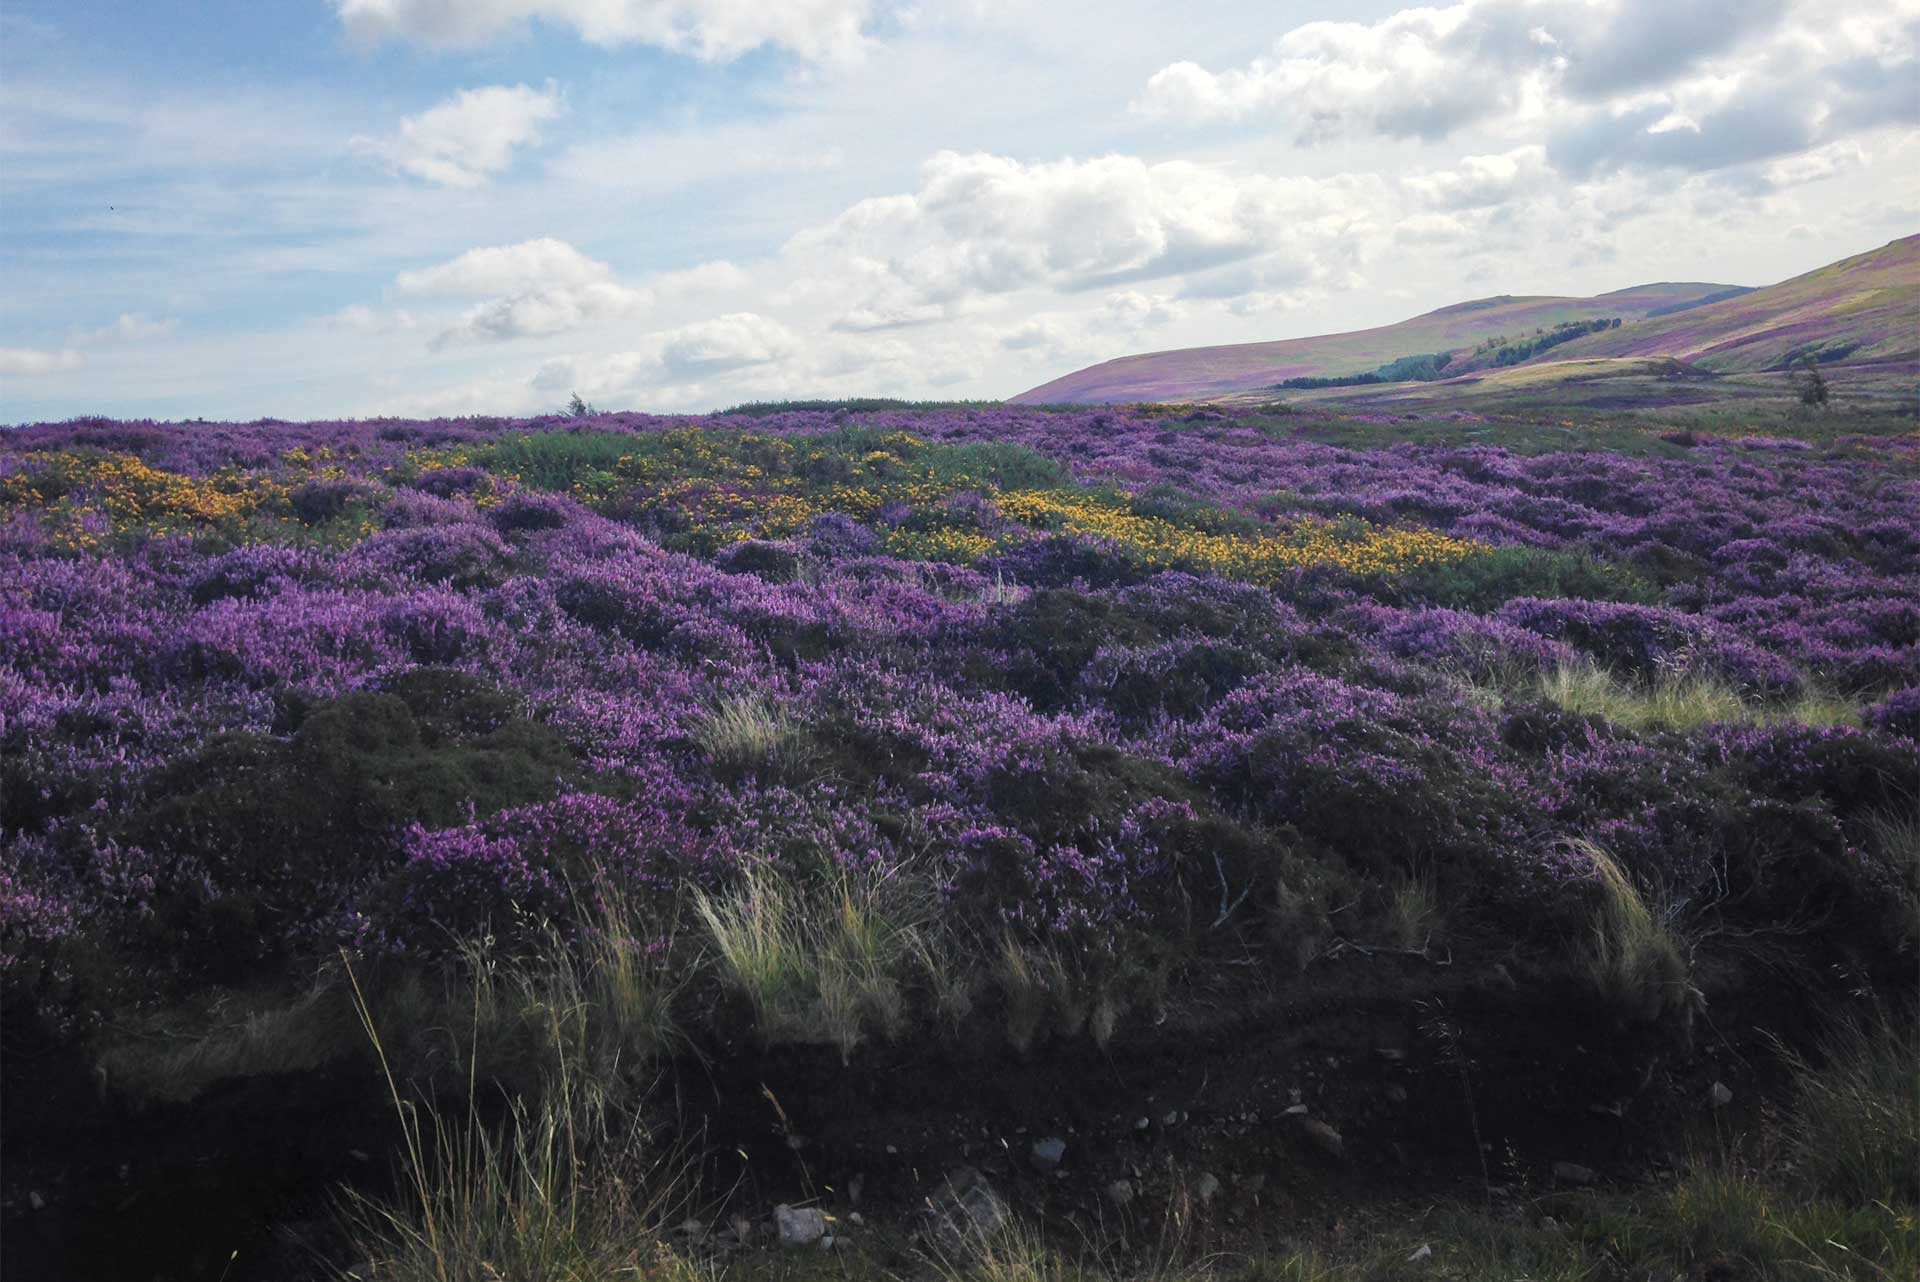 Purple heather + yellow flowers